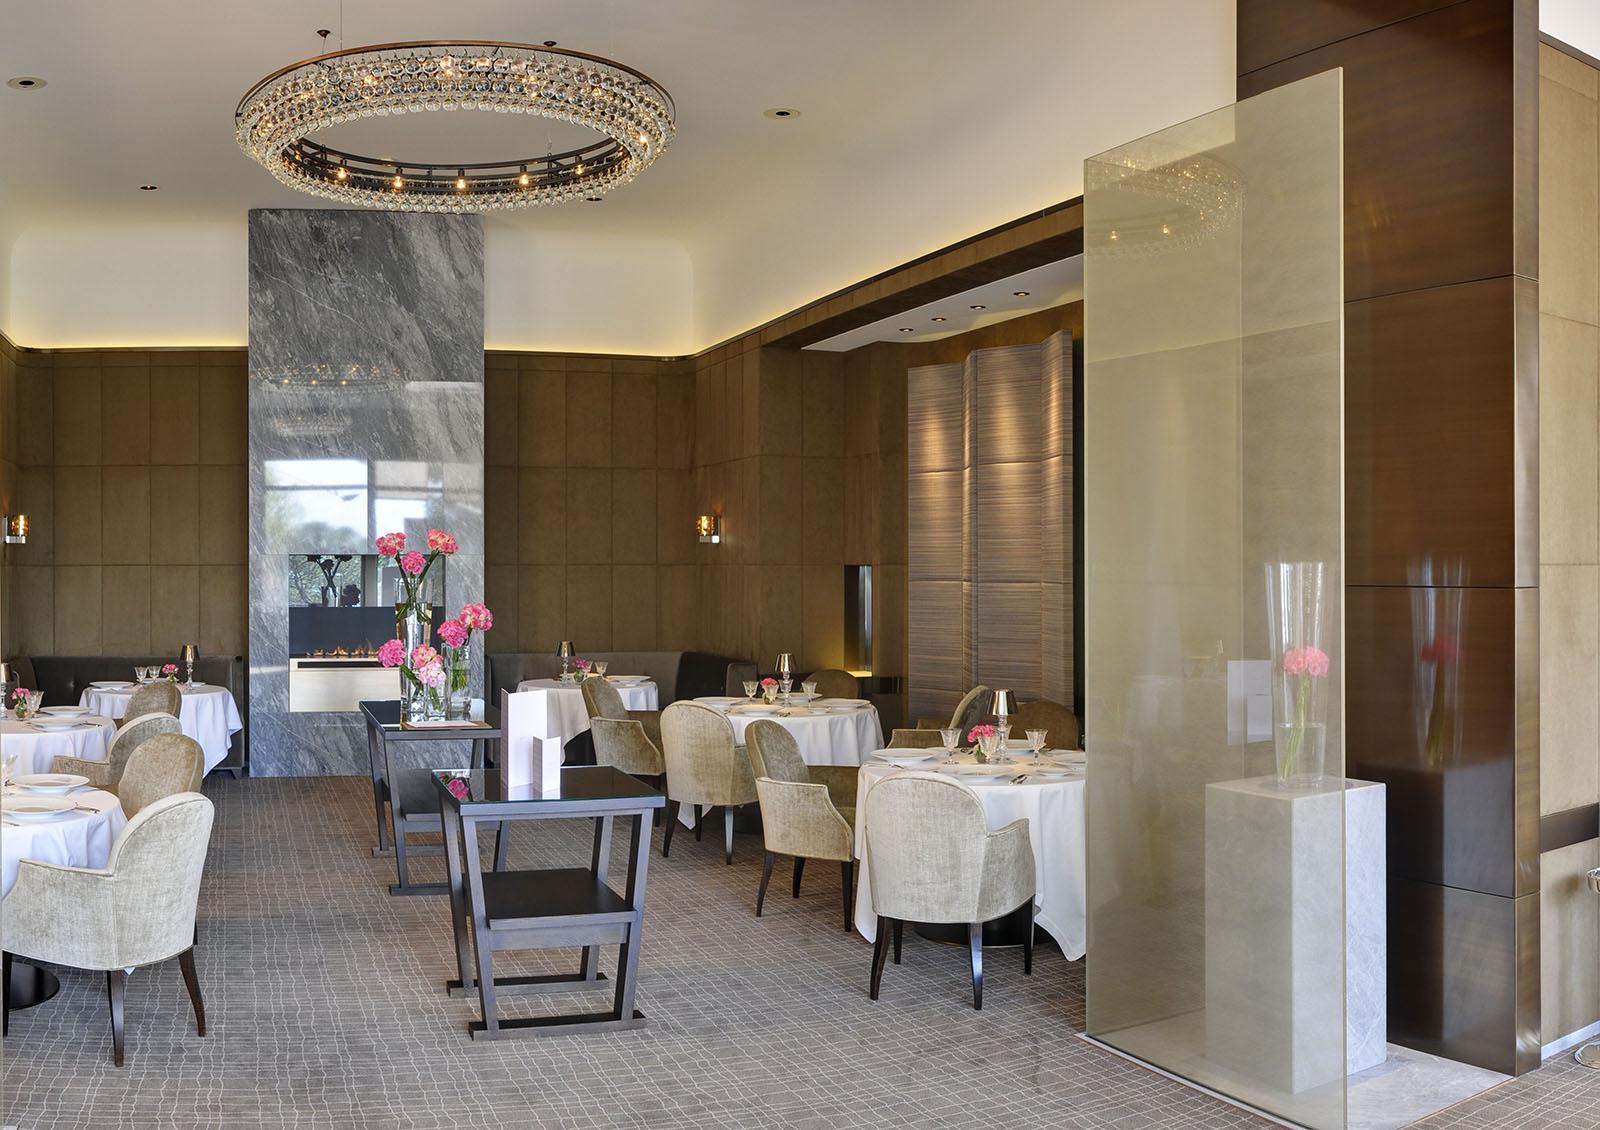 Beau-Rivage-Hotel-Geneve-Switzerland2.jpg